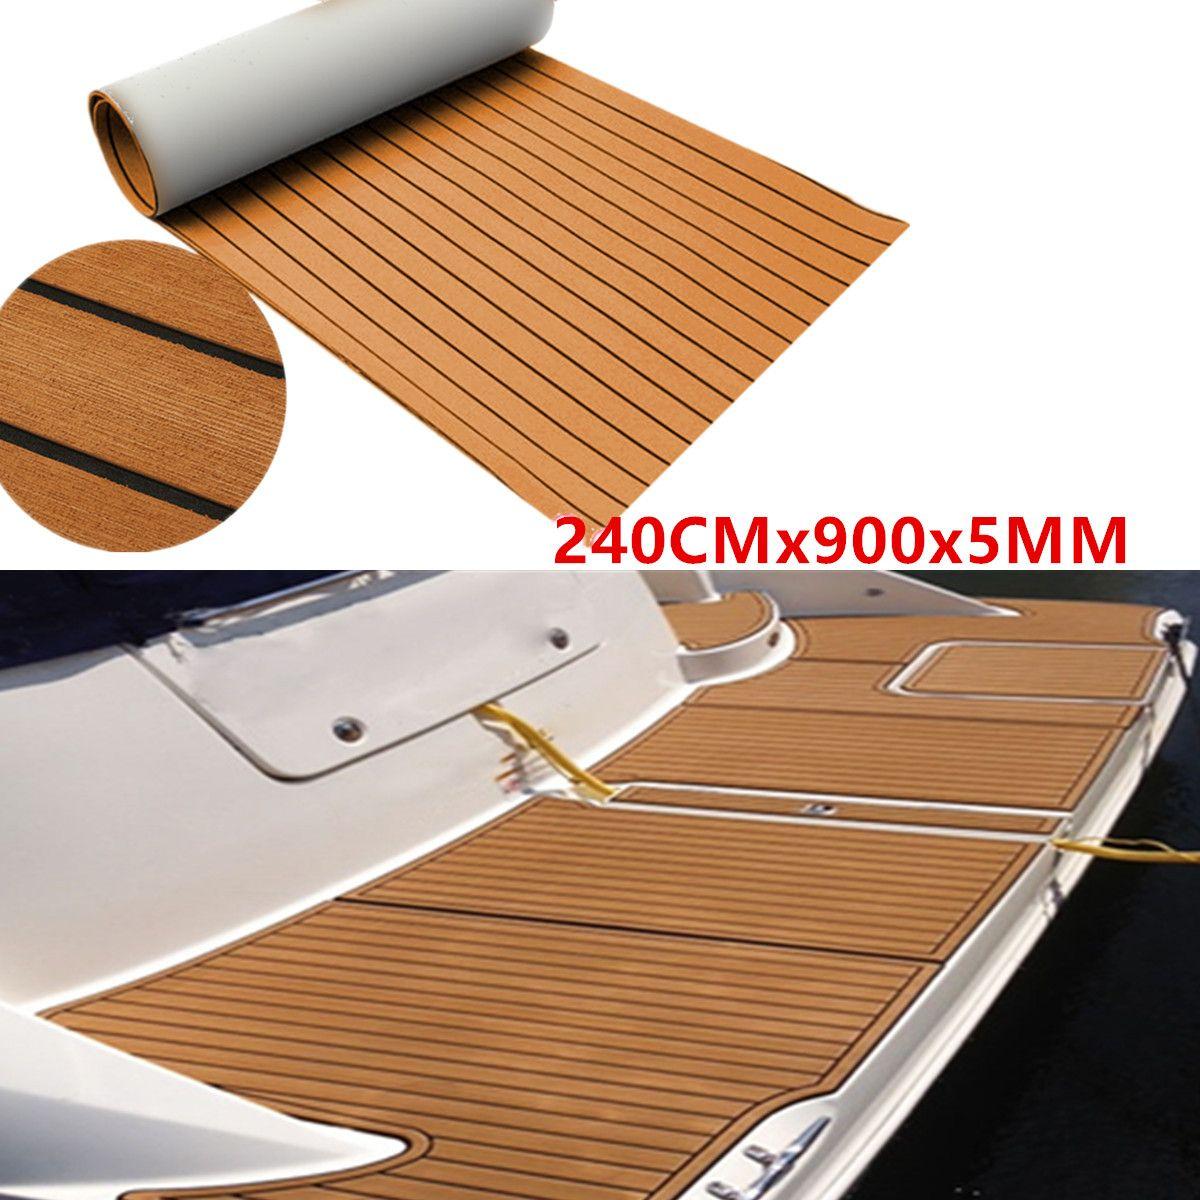 2400x900mm Thicken EVA Foam Boat Yacht RV Caravan Marine Flooring Faux Teak Boat Decking Non skid